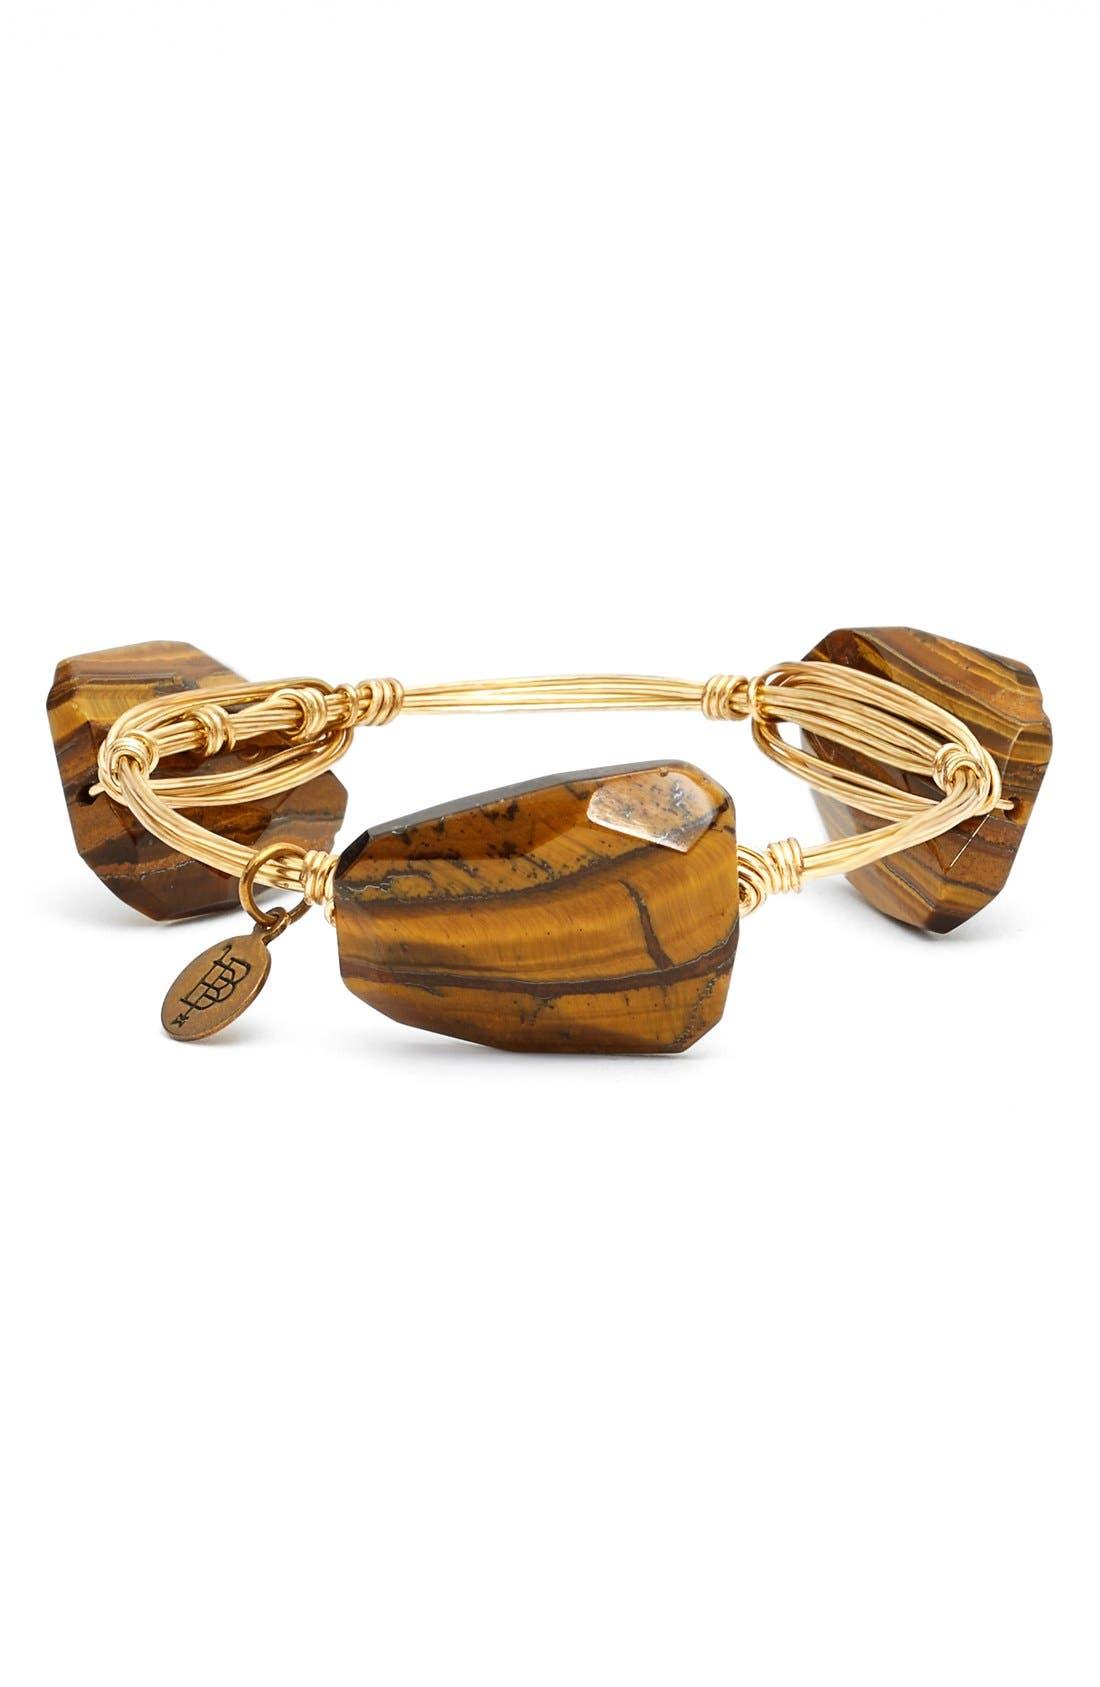 'Tiger's Eye Agate & Jet Acrylic Crystal' Stone Bracelets,                             Alternate thumbnail 2, color,                             200